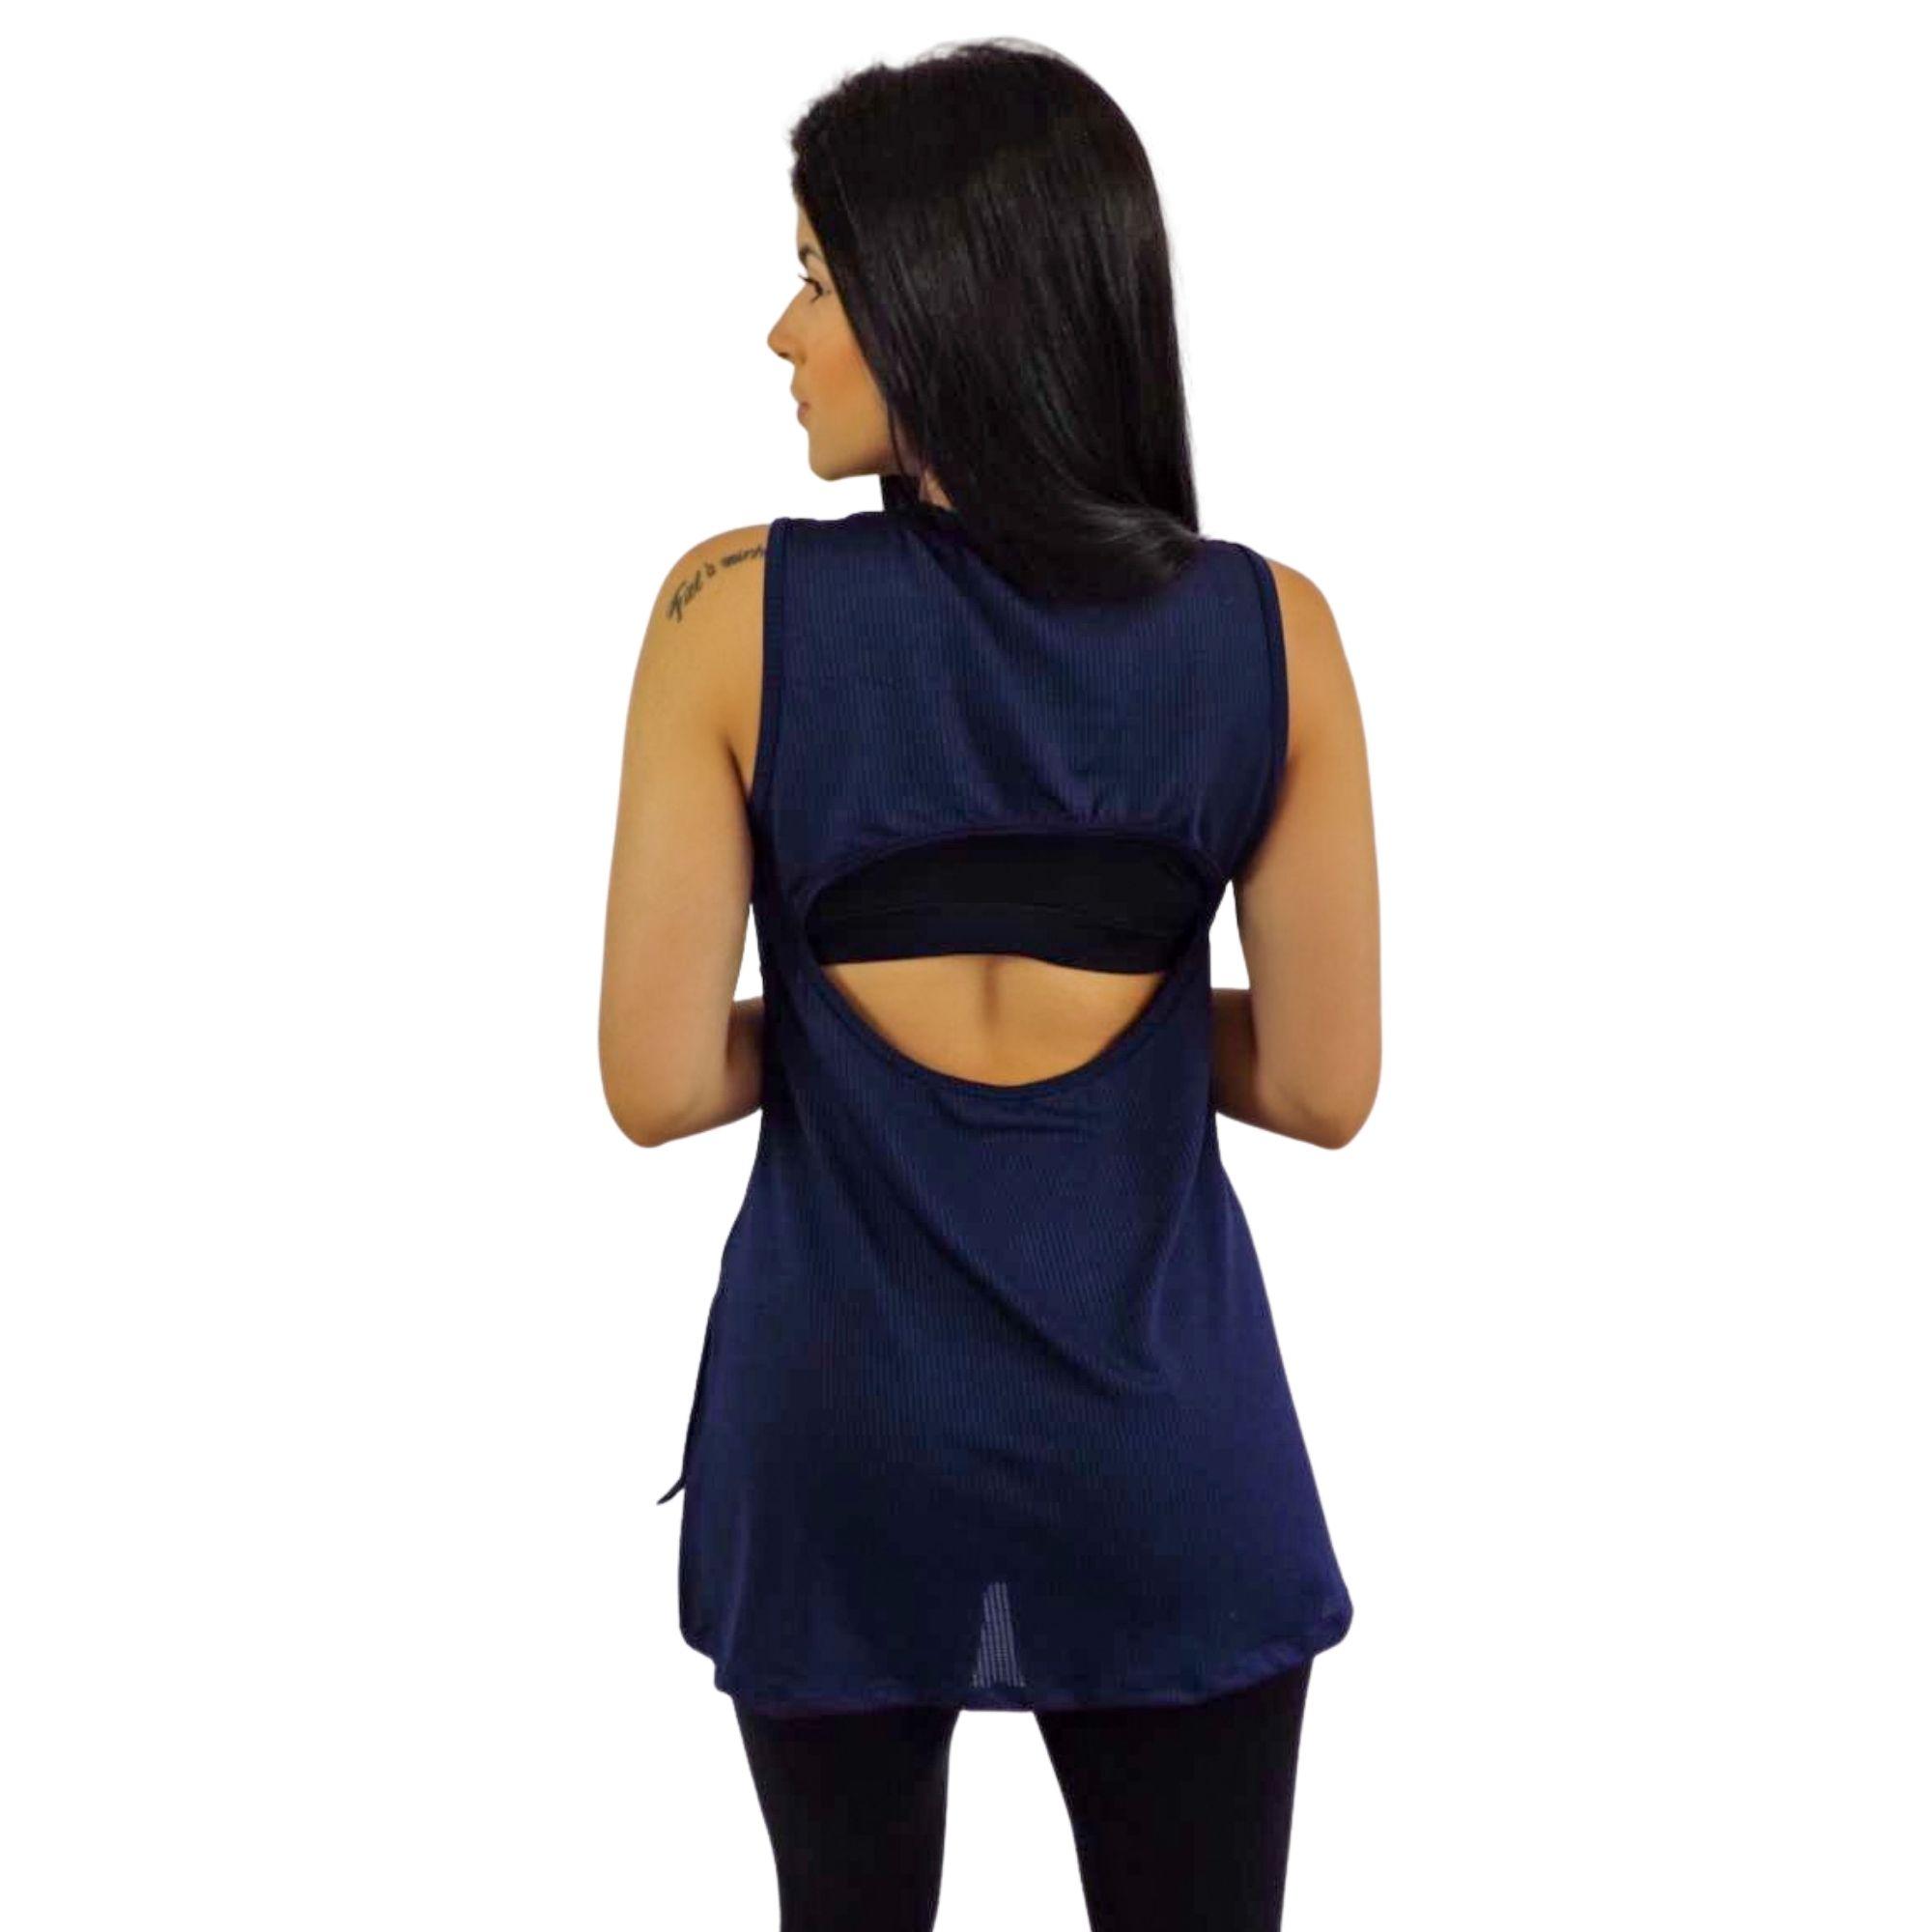 Camiseta Regata Feminina Dry Fit Azul Marinho